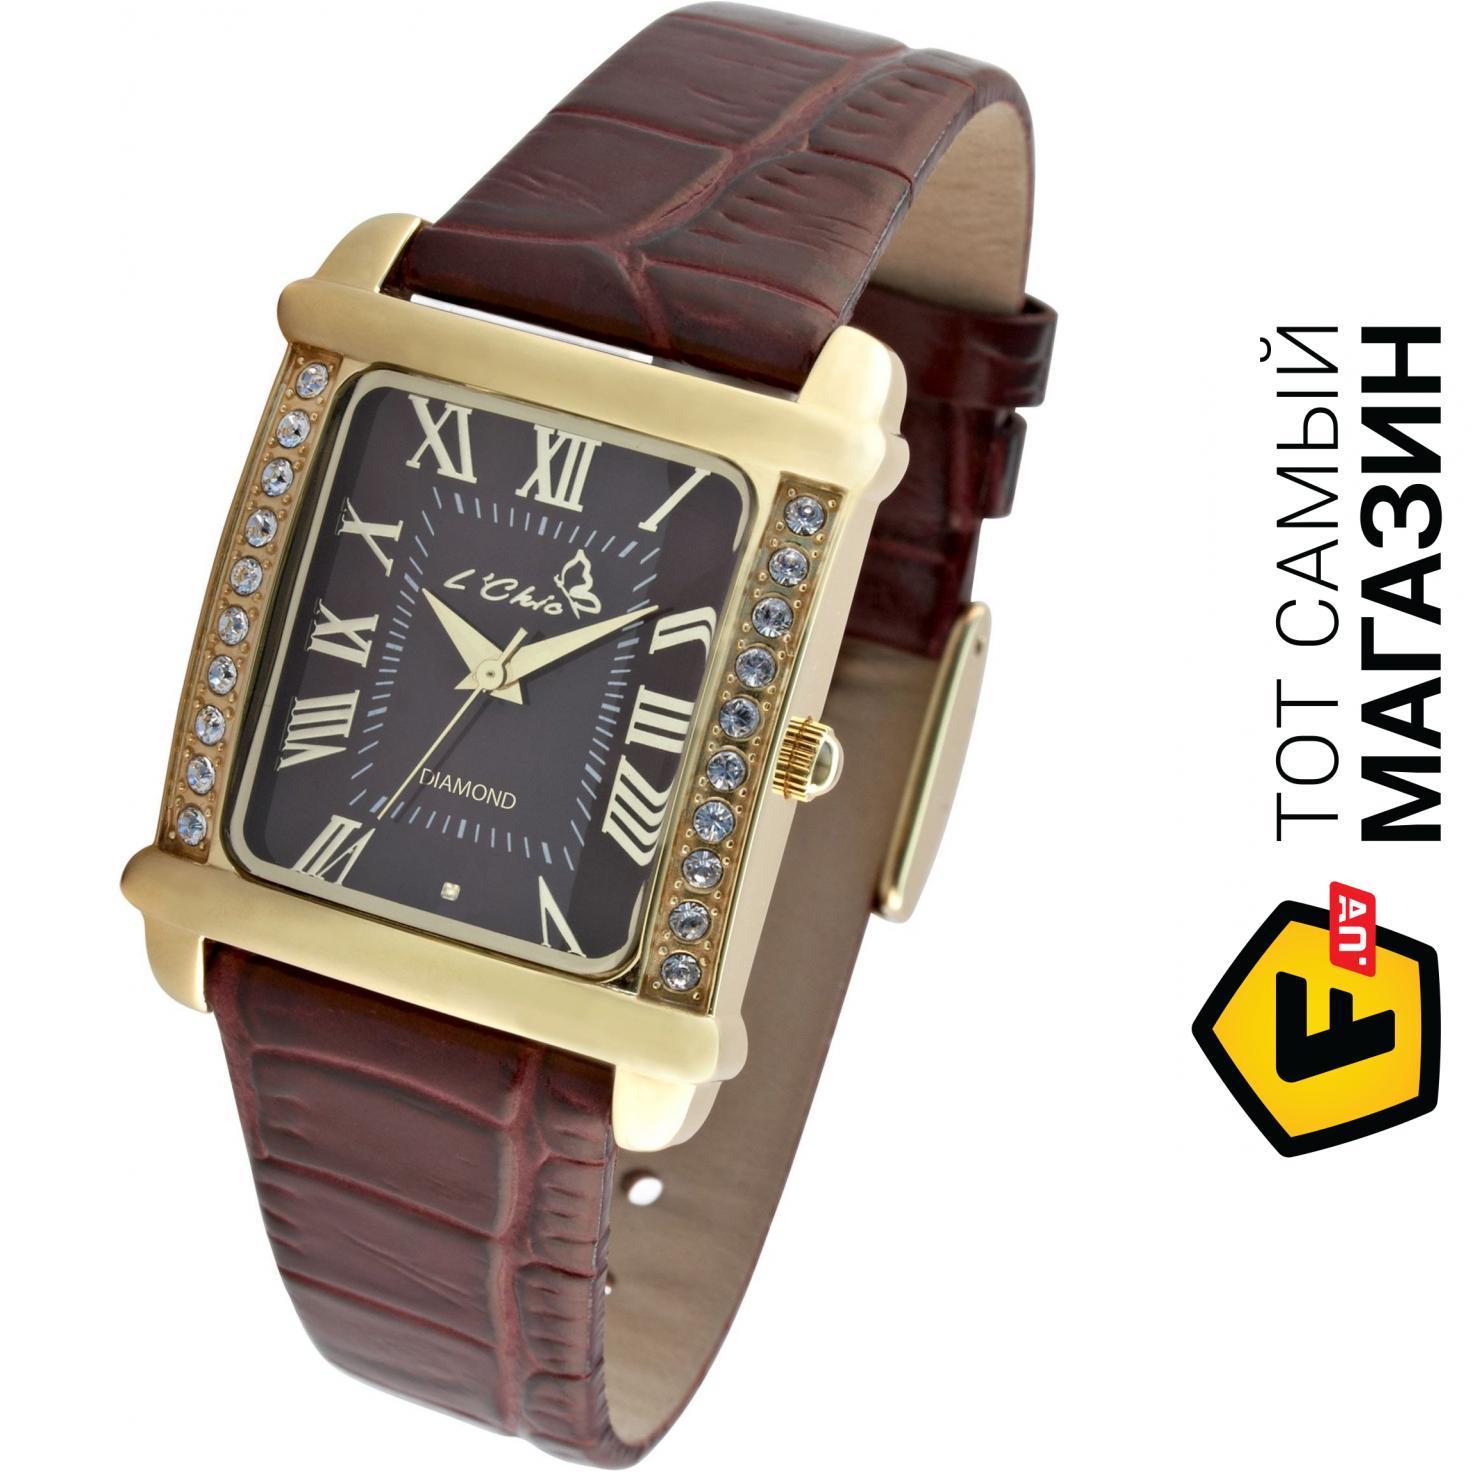 abed463f67306 ᐈ L'CHIC Женские часы Le Chic CL 7855D G Коричневый ~ Купить? ЦЕНА ...